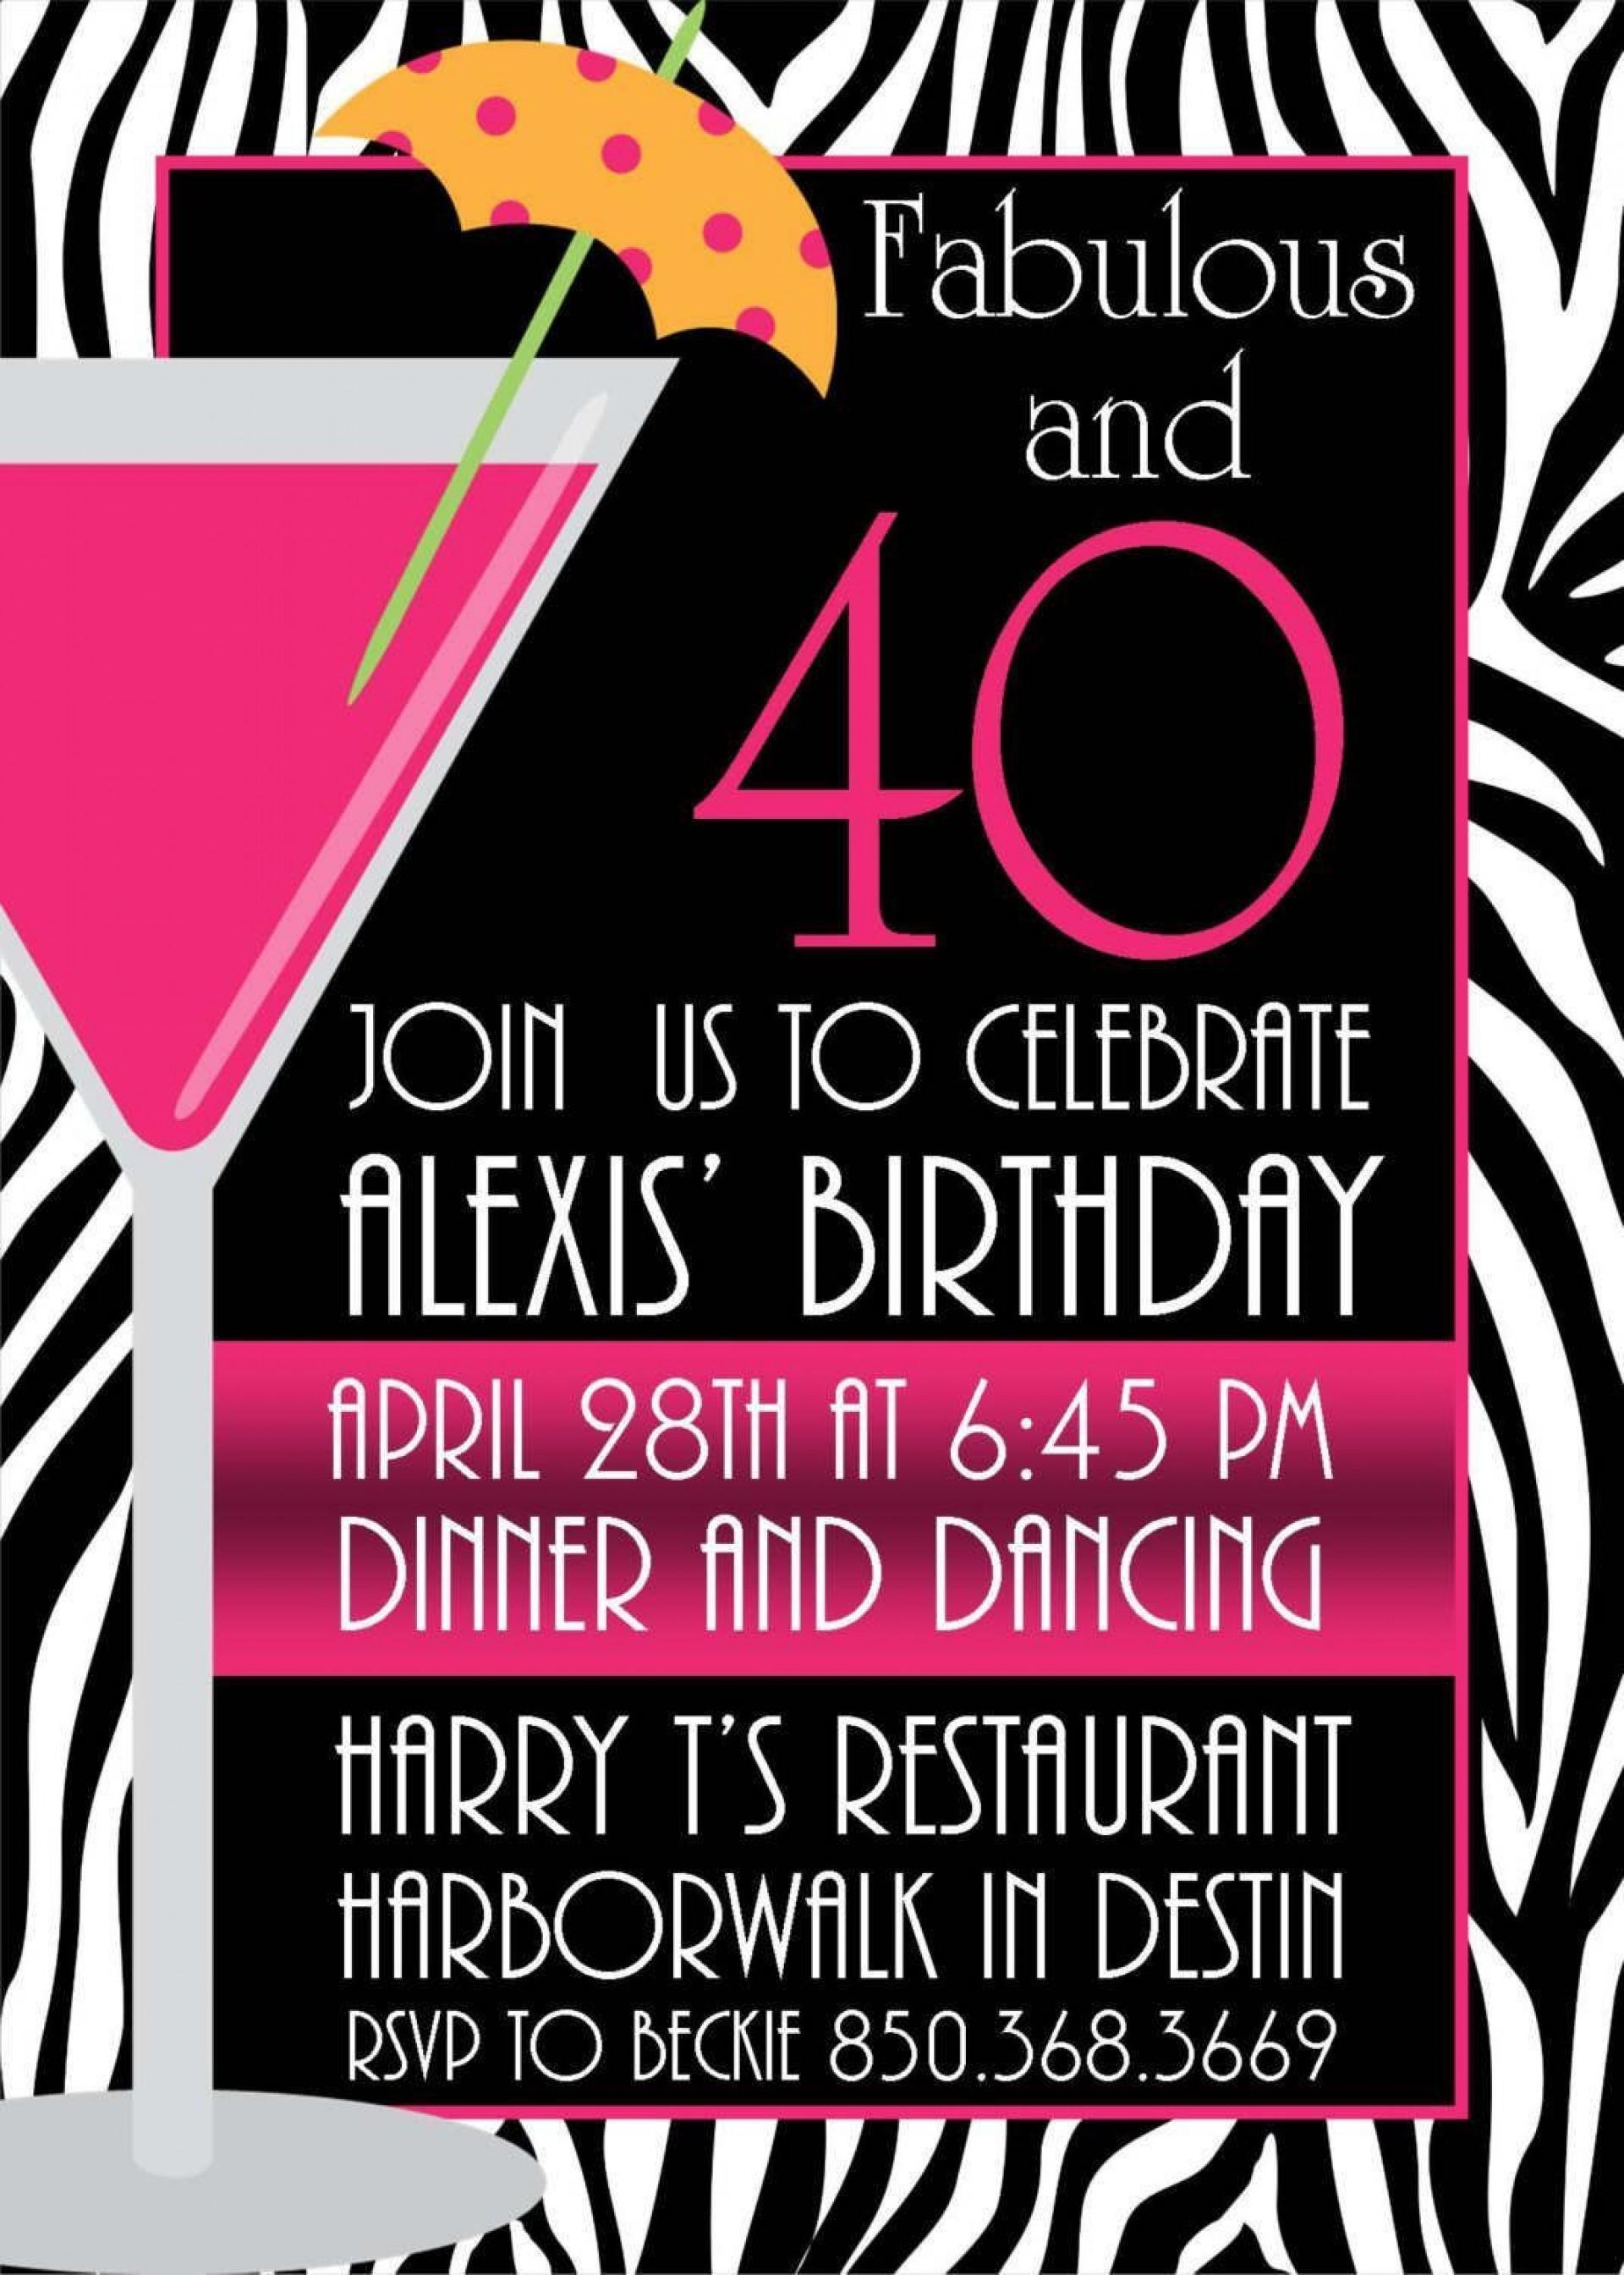 005 Breathtaking 40th Birthday Party Invite Template Free Design 1920